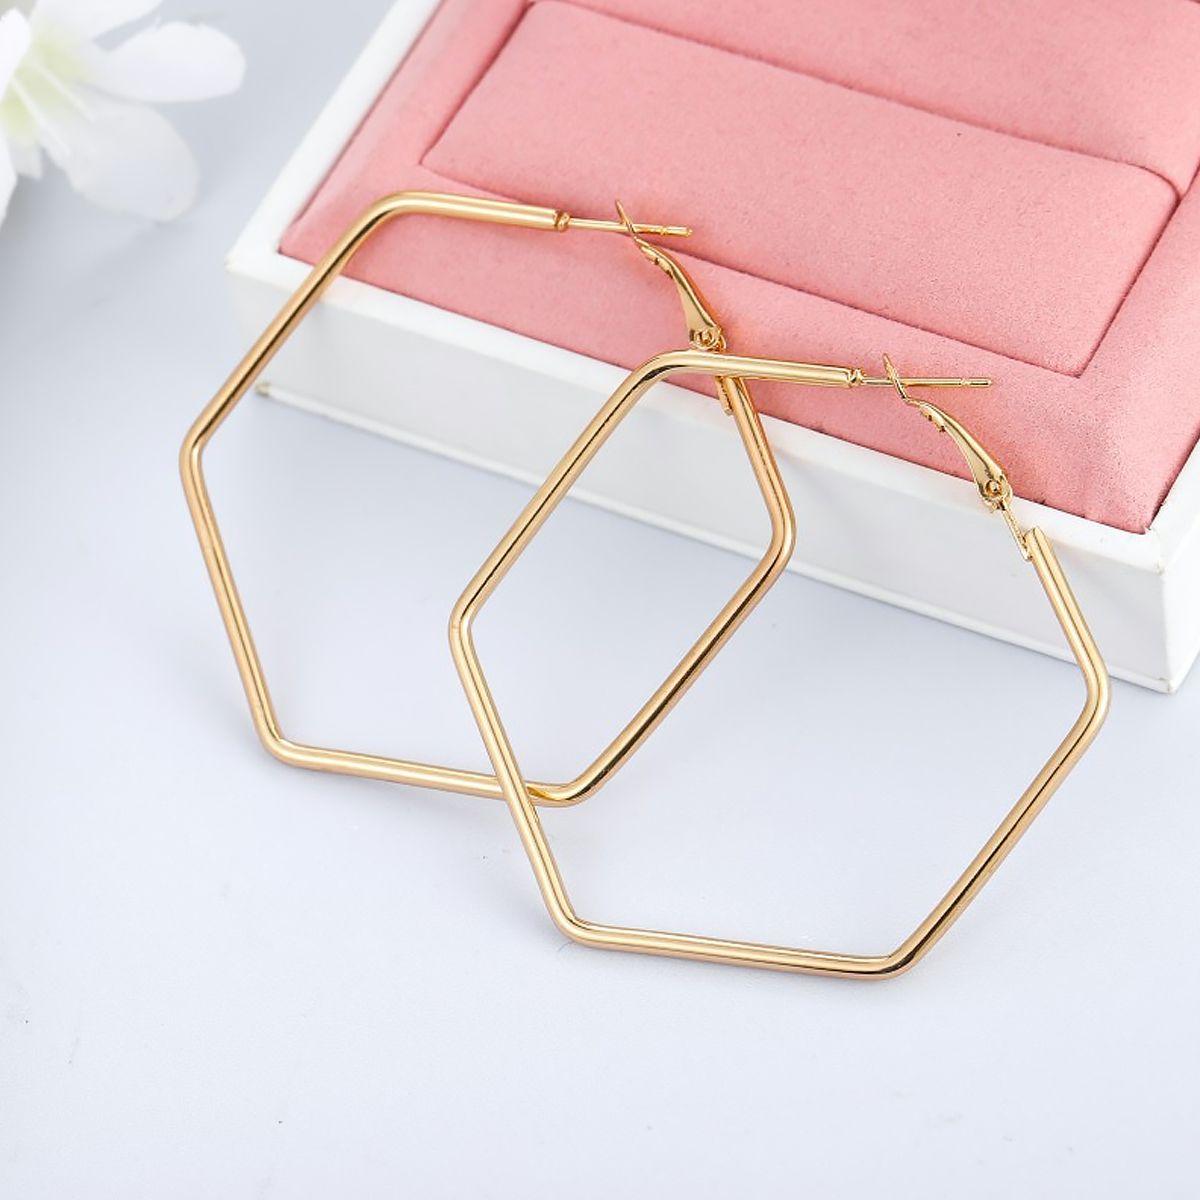 New Fashion Geometric Style Earrings Big Hexagonal Circle Earrings Women Fashion Accessories golden 5.0CM